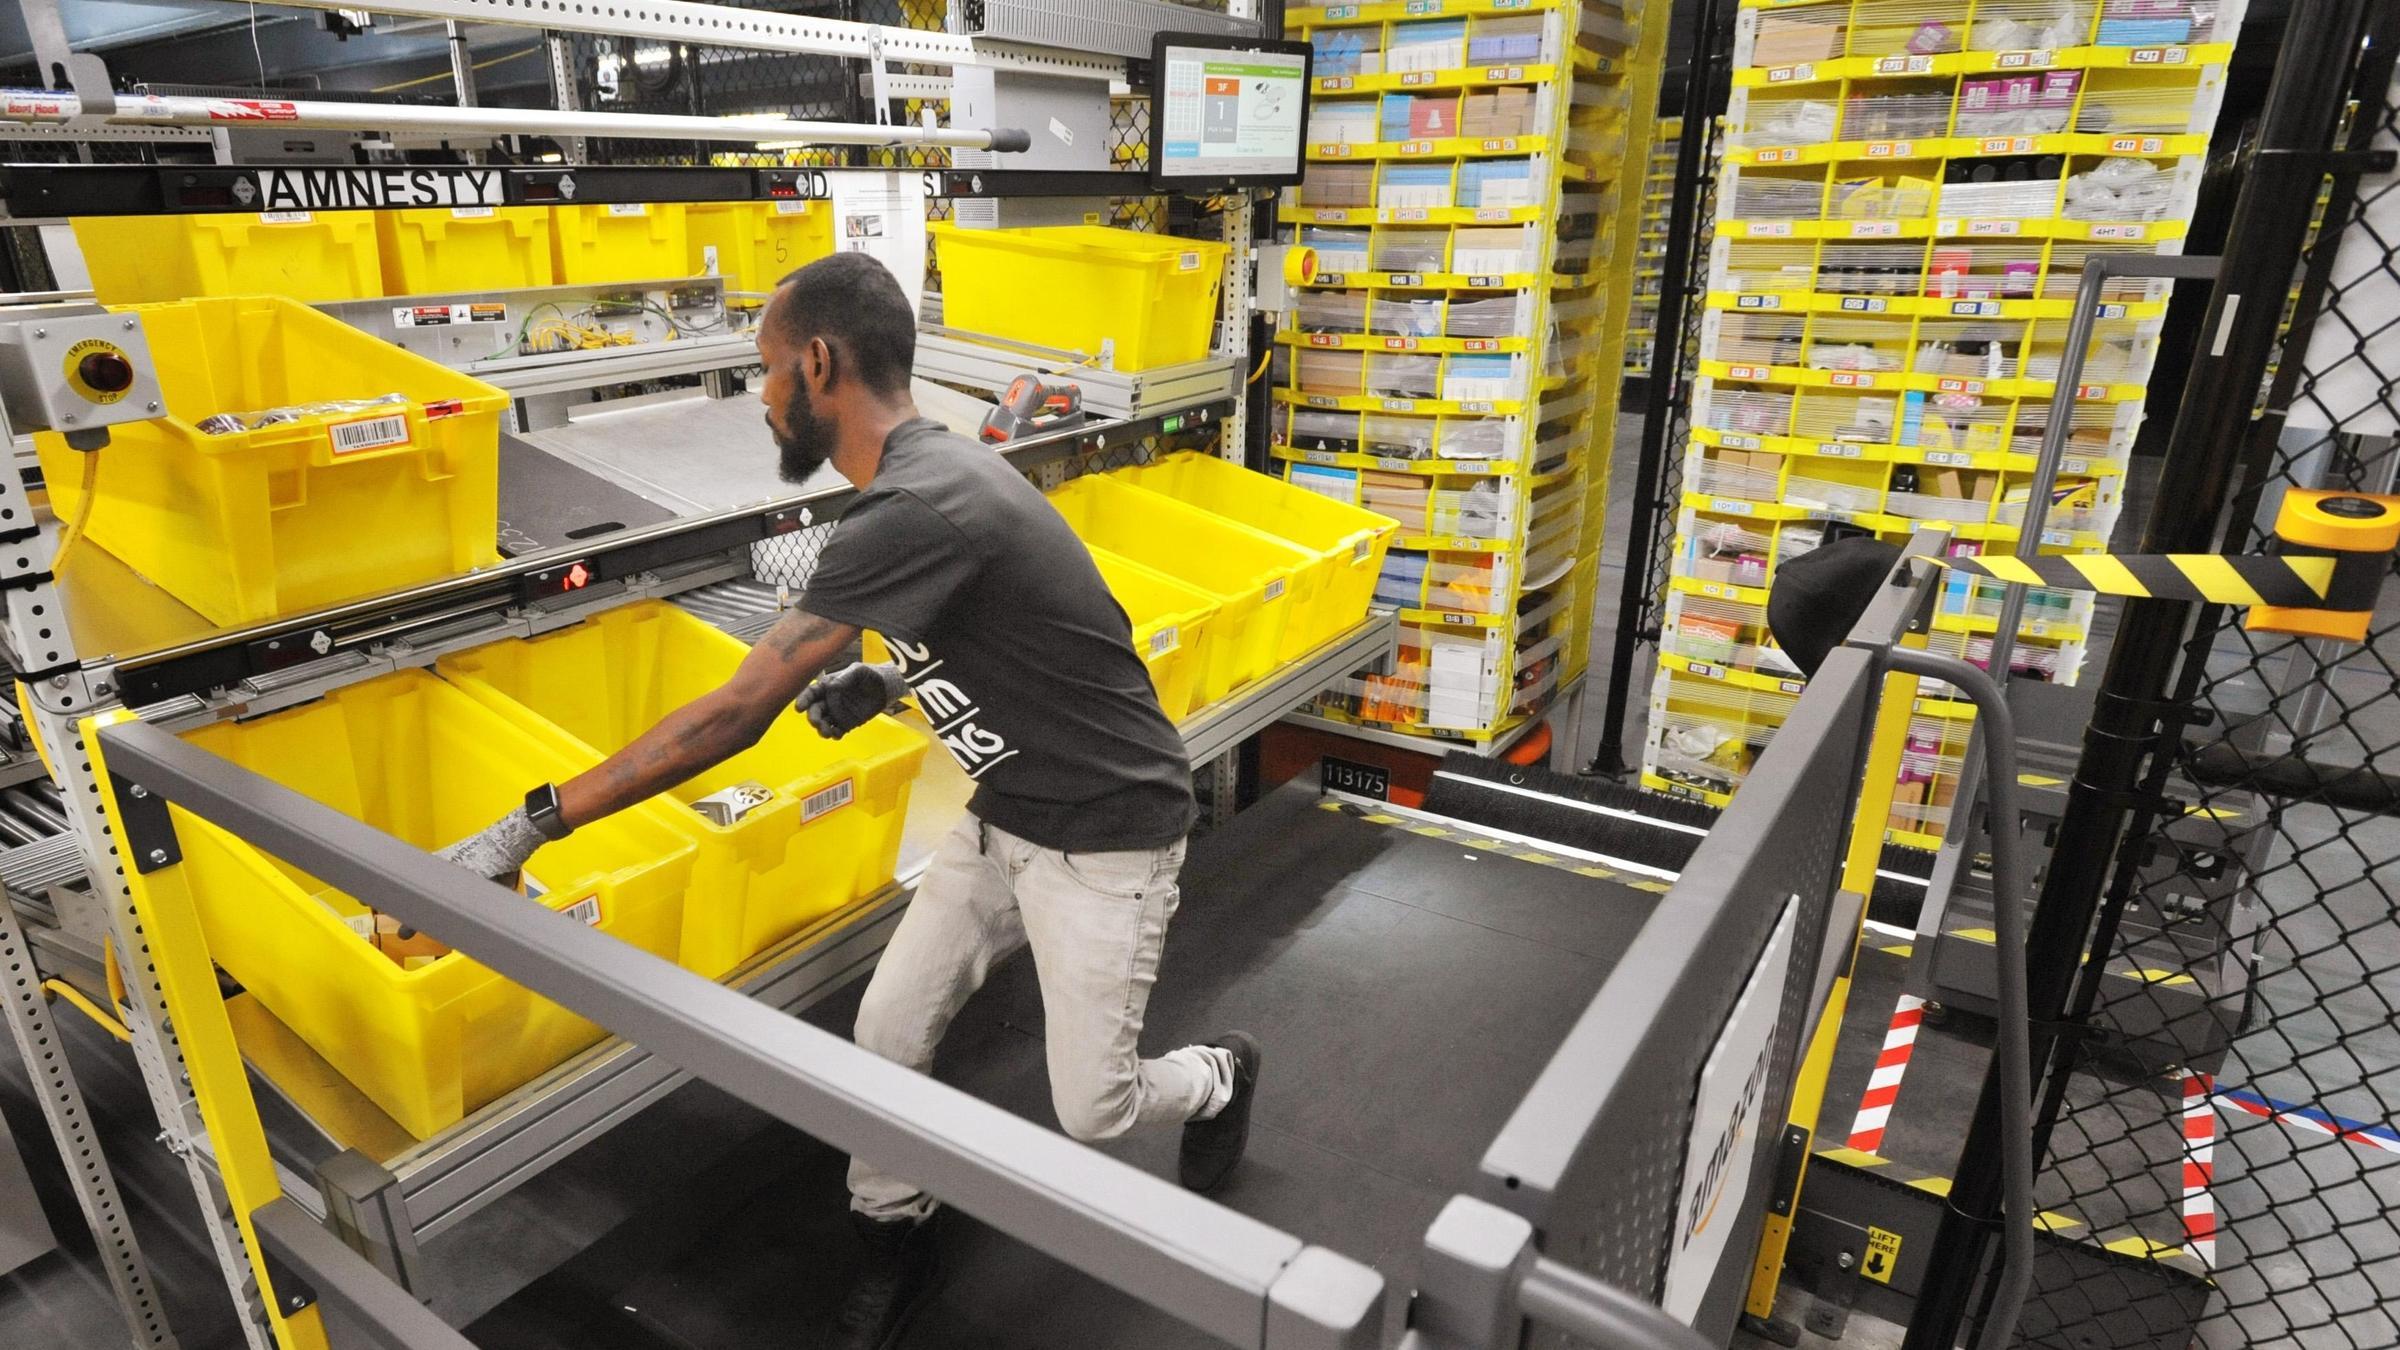 foto Amazon warehouse worker slams working conditions in Guardian op-ed